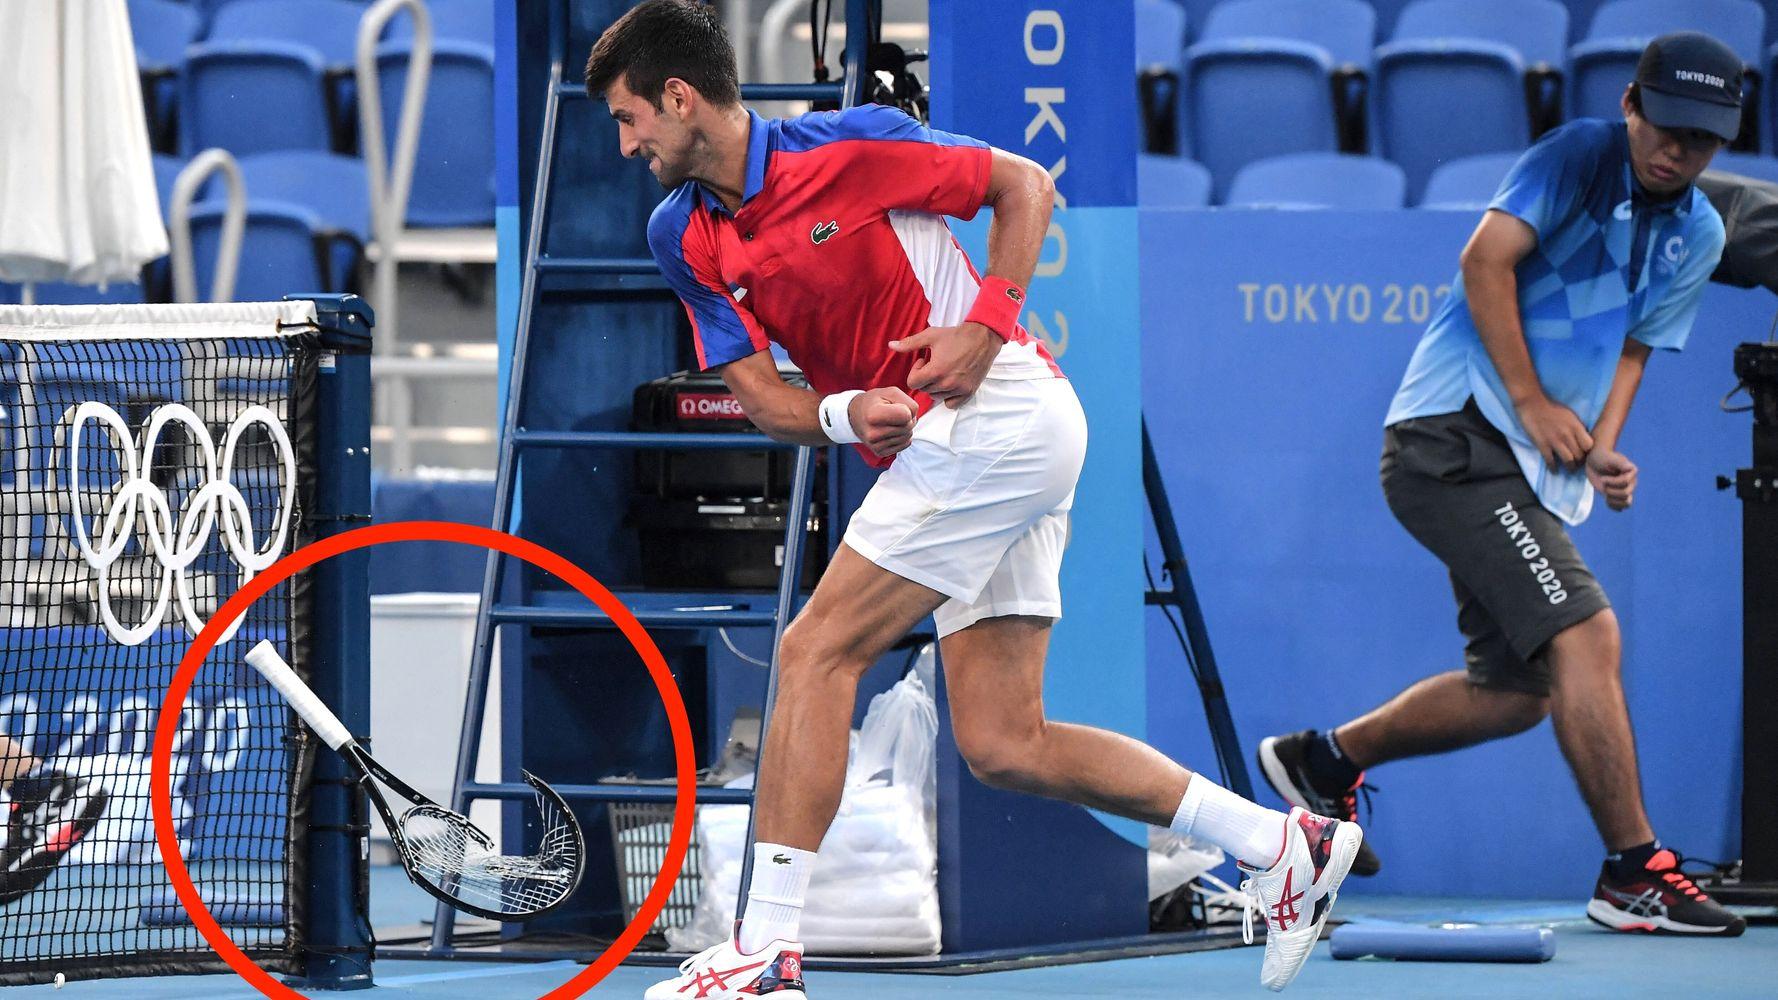 Novak Djokovic's Racket Ends Up Just Like His Golden Slam Dreams, In Absolute Ruins